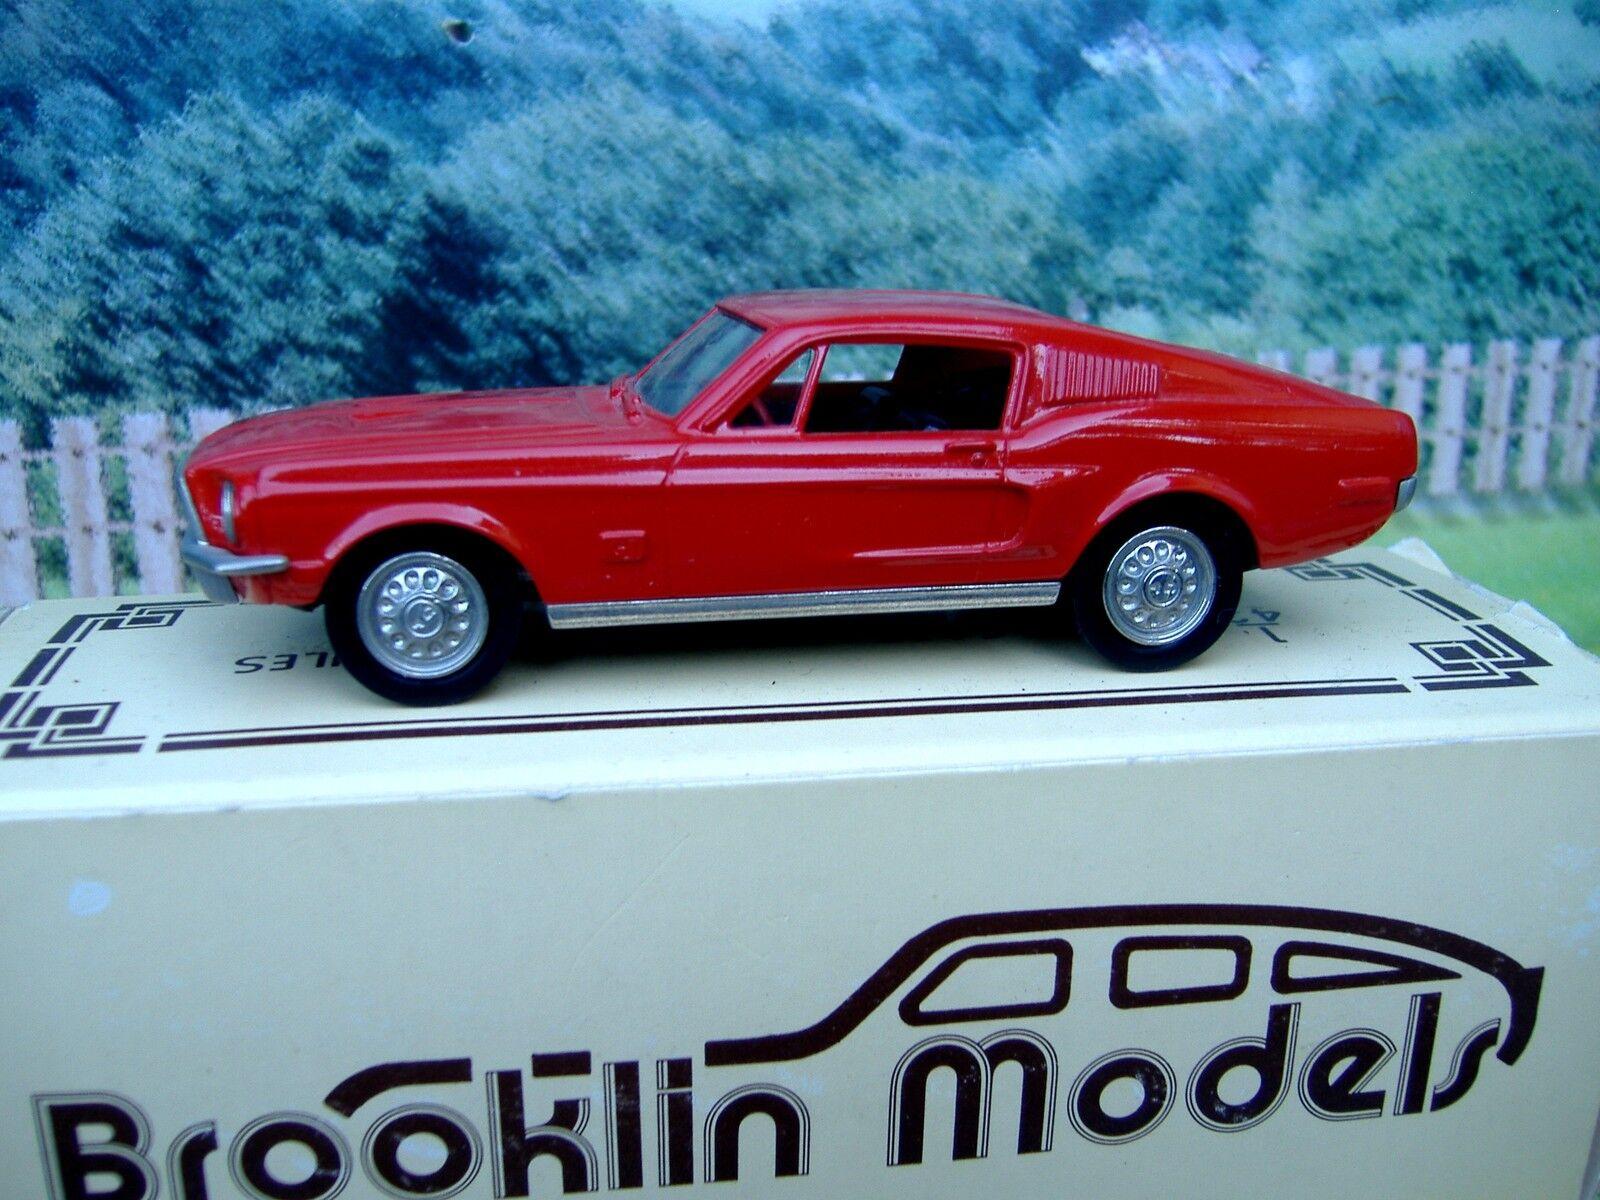 1 43 Brooklin models  Shelby mustang 1968